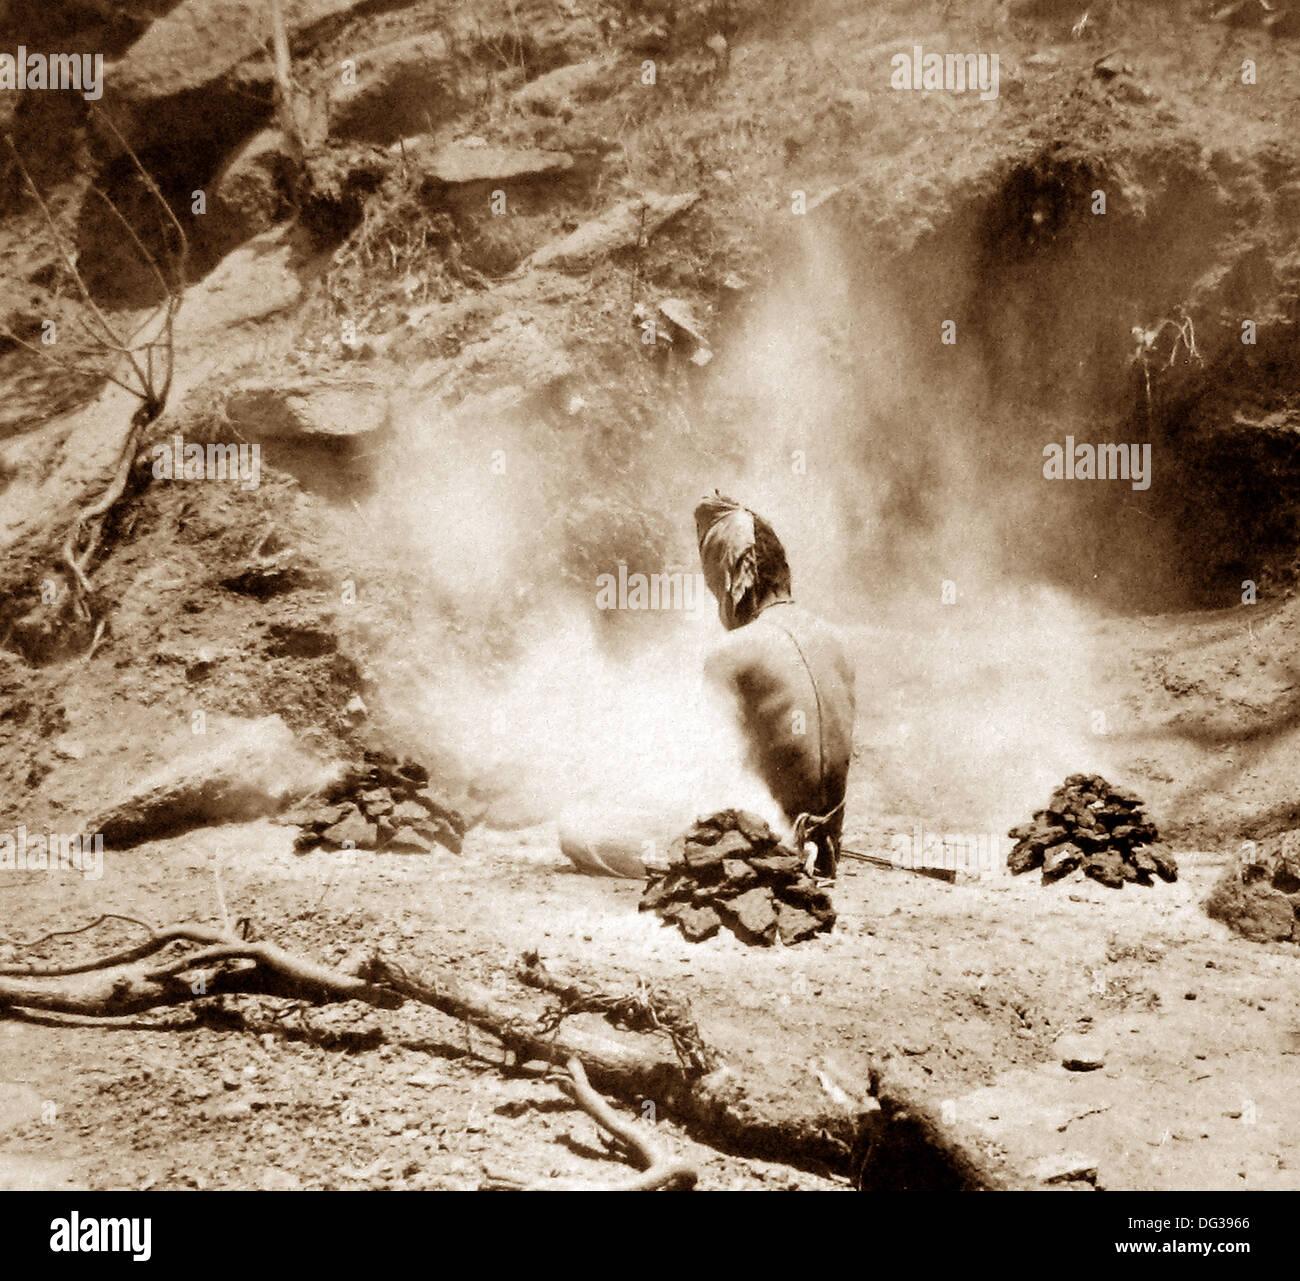 India - Hermit doing penance Gem Lake Mount Abu early 1900s - Stock Image